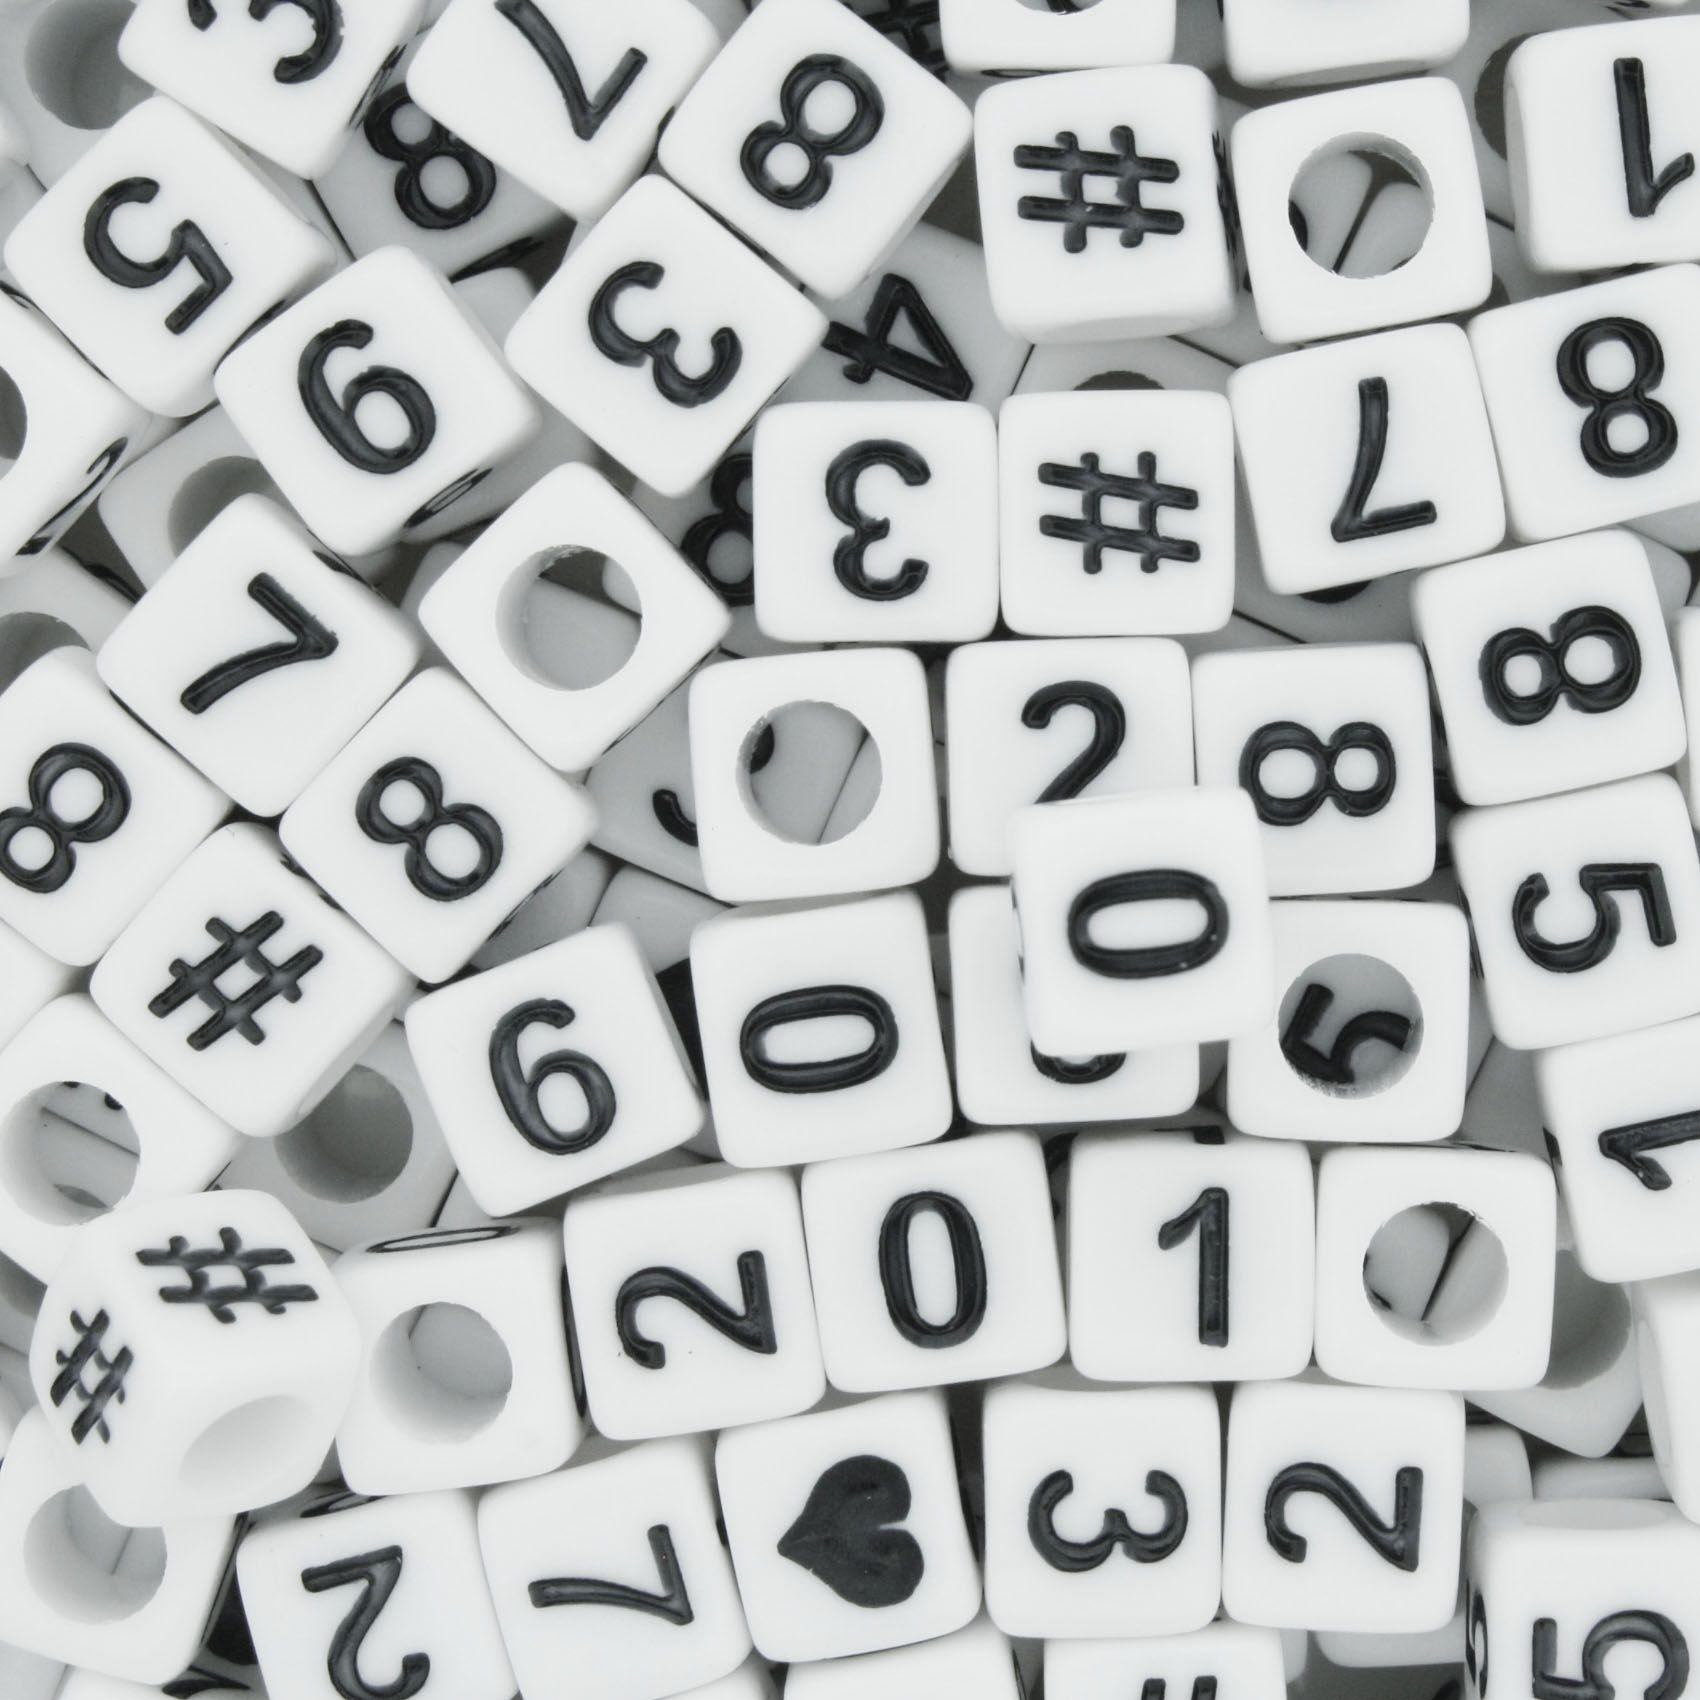 Miçanga - Números Cubo Branco Preto  - Stéphanie Bijoux® - Peças para Bijuterias e Artesanato